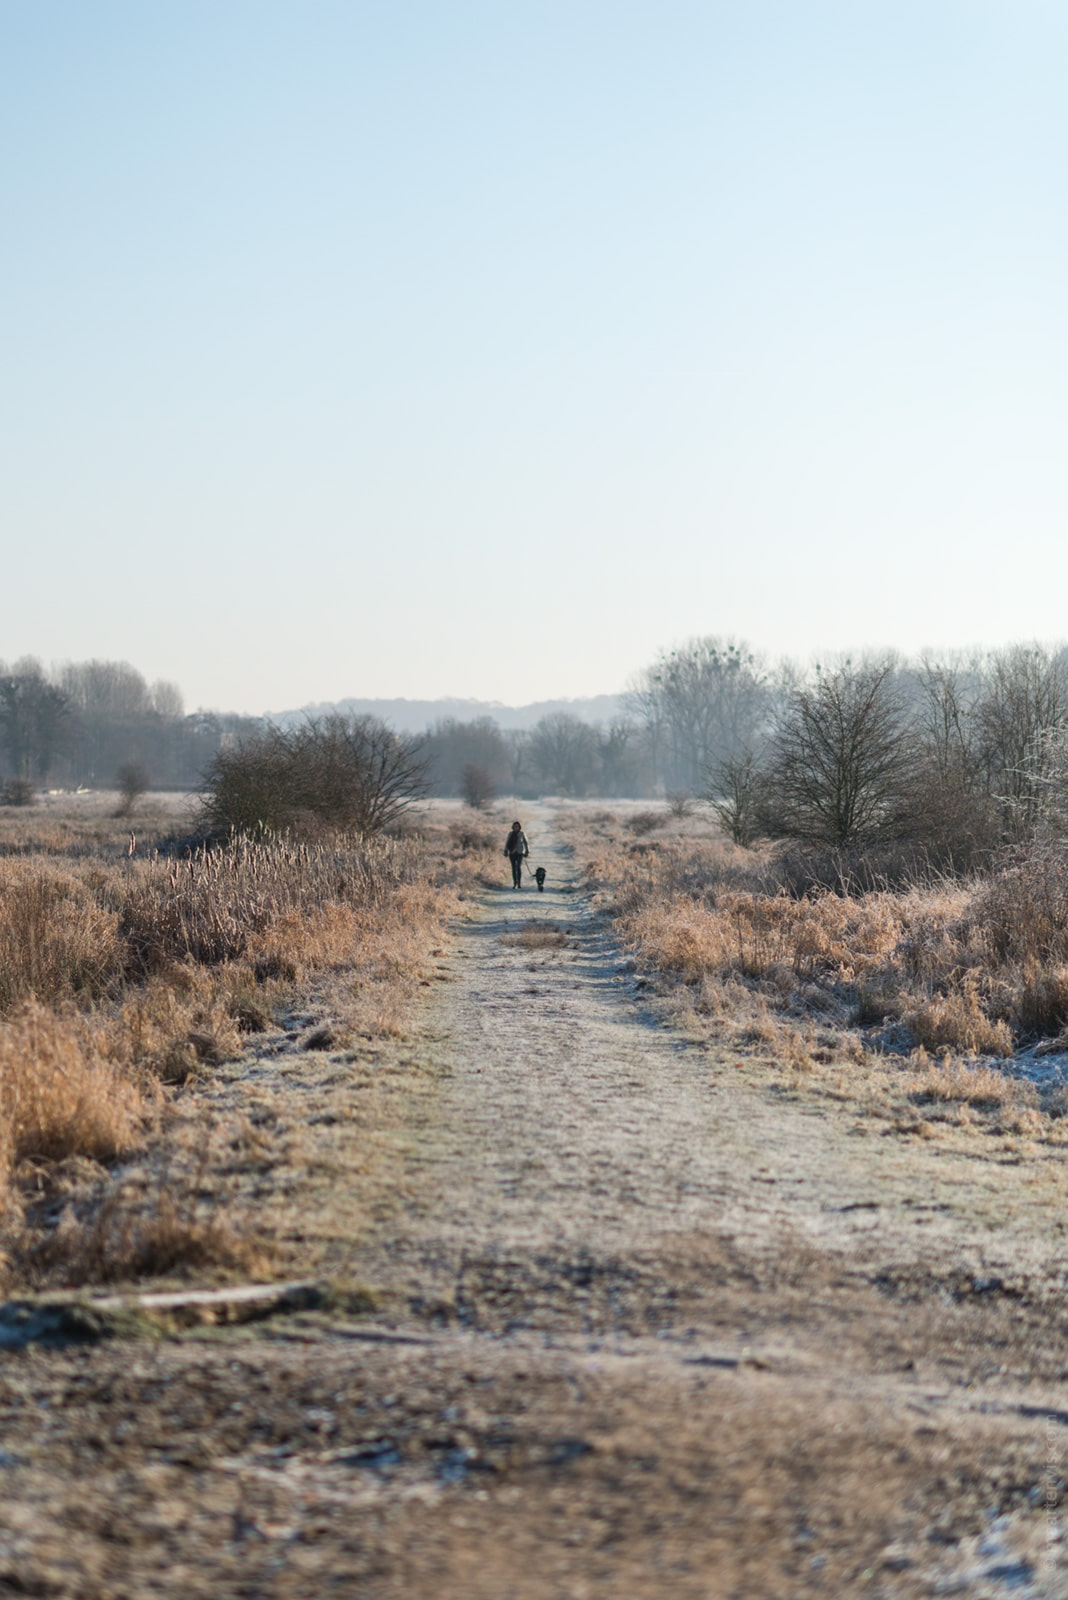 Winter in Limburg The Netherlands   Winter in Limburg The Netherlands